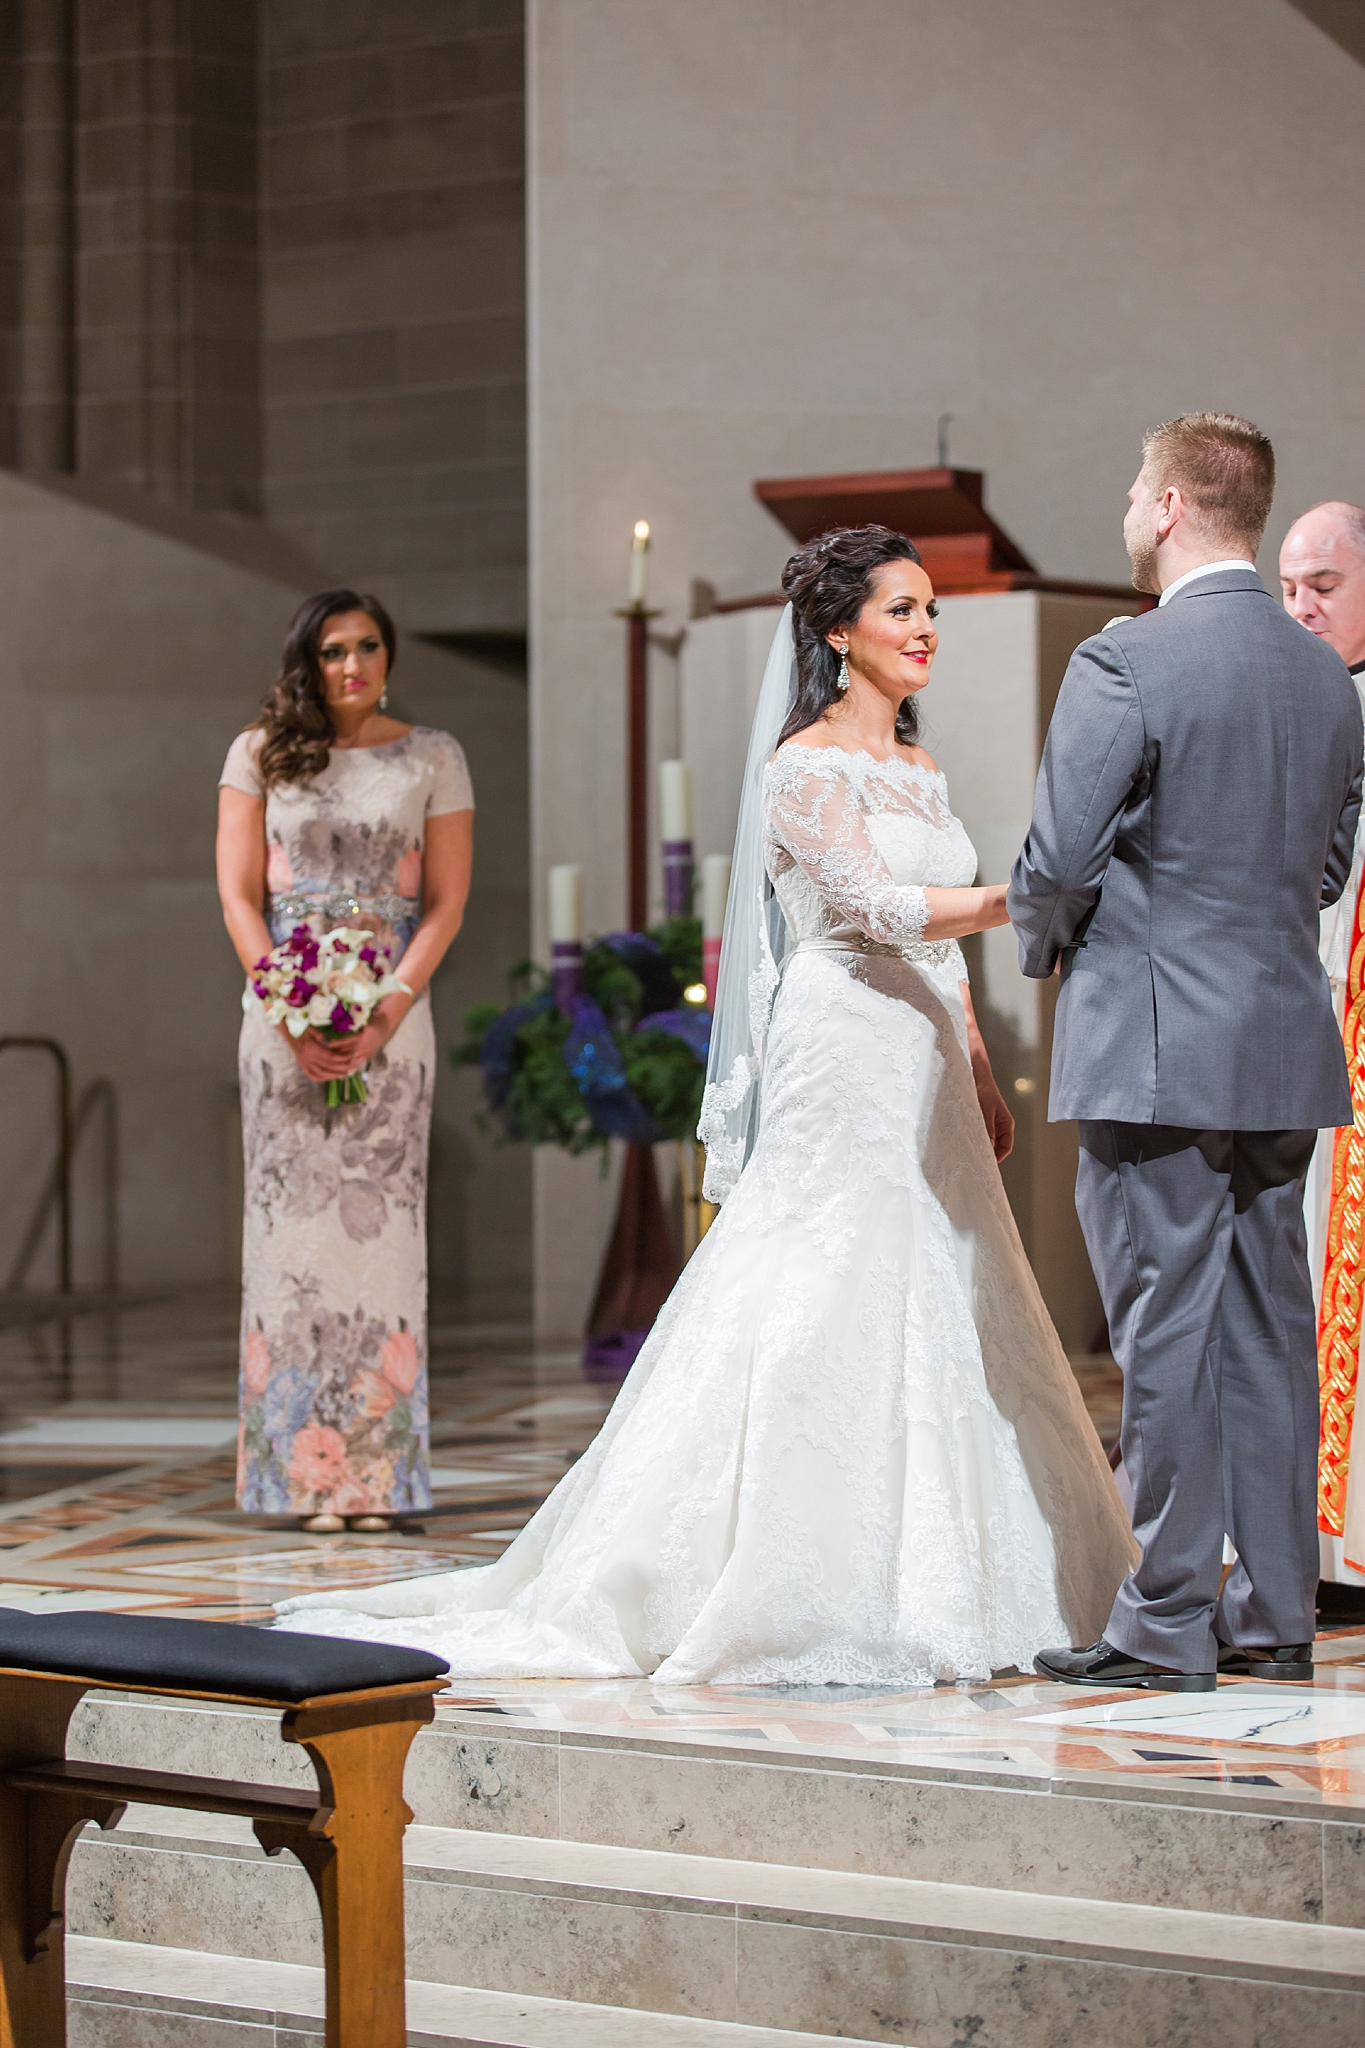 detroit-colony-club-wedding-regal-romantic-photography-in-detroit-mi-by-courtney-carolyn-photography_0028.jpg